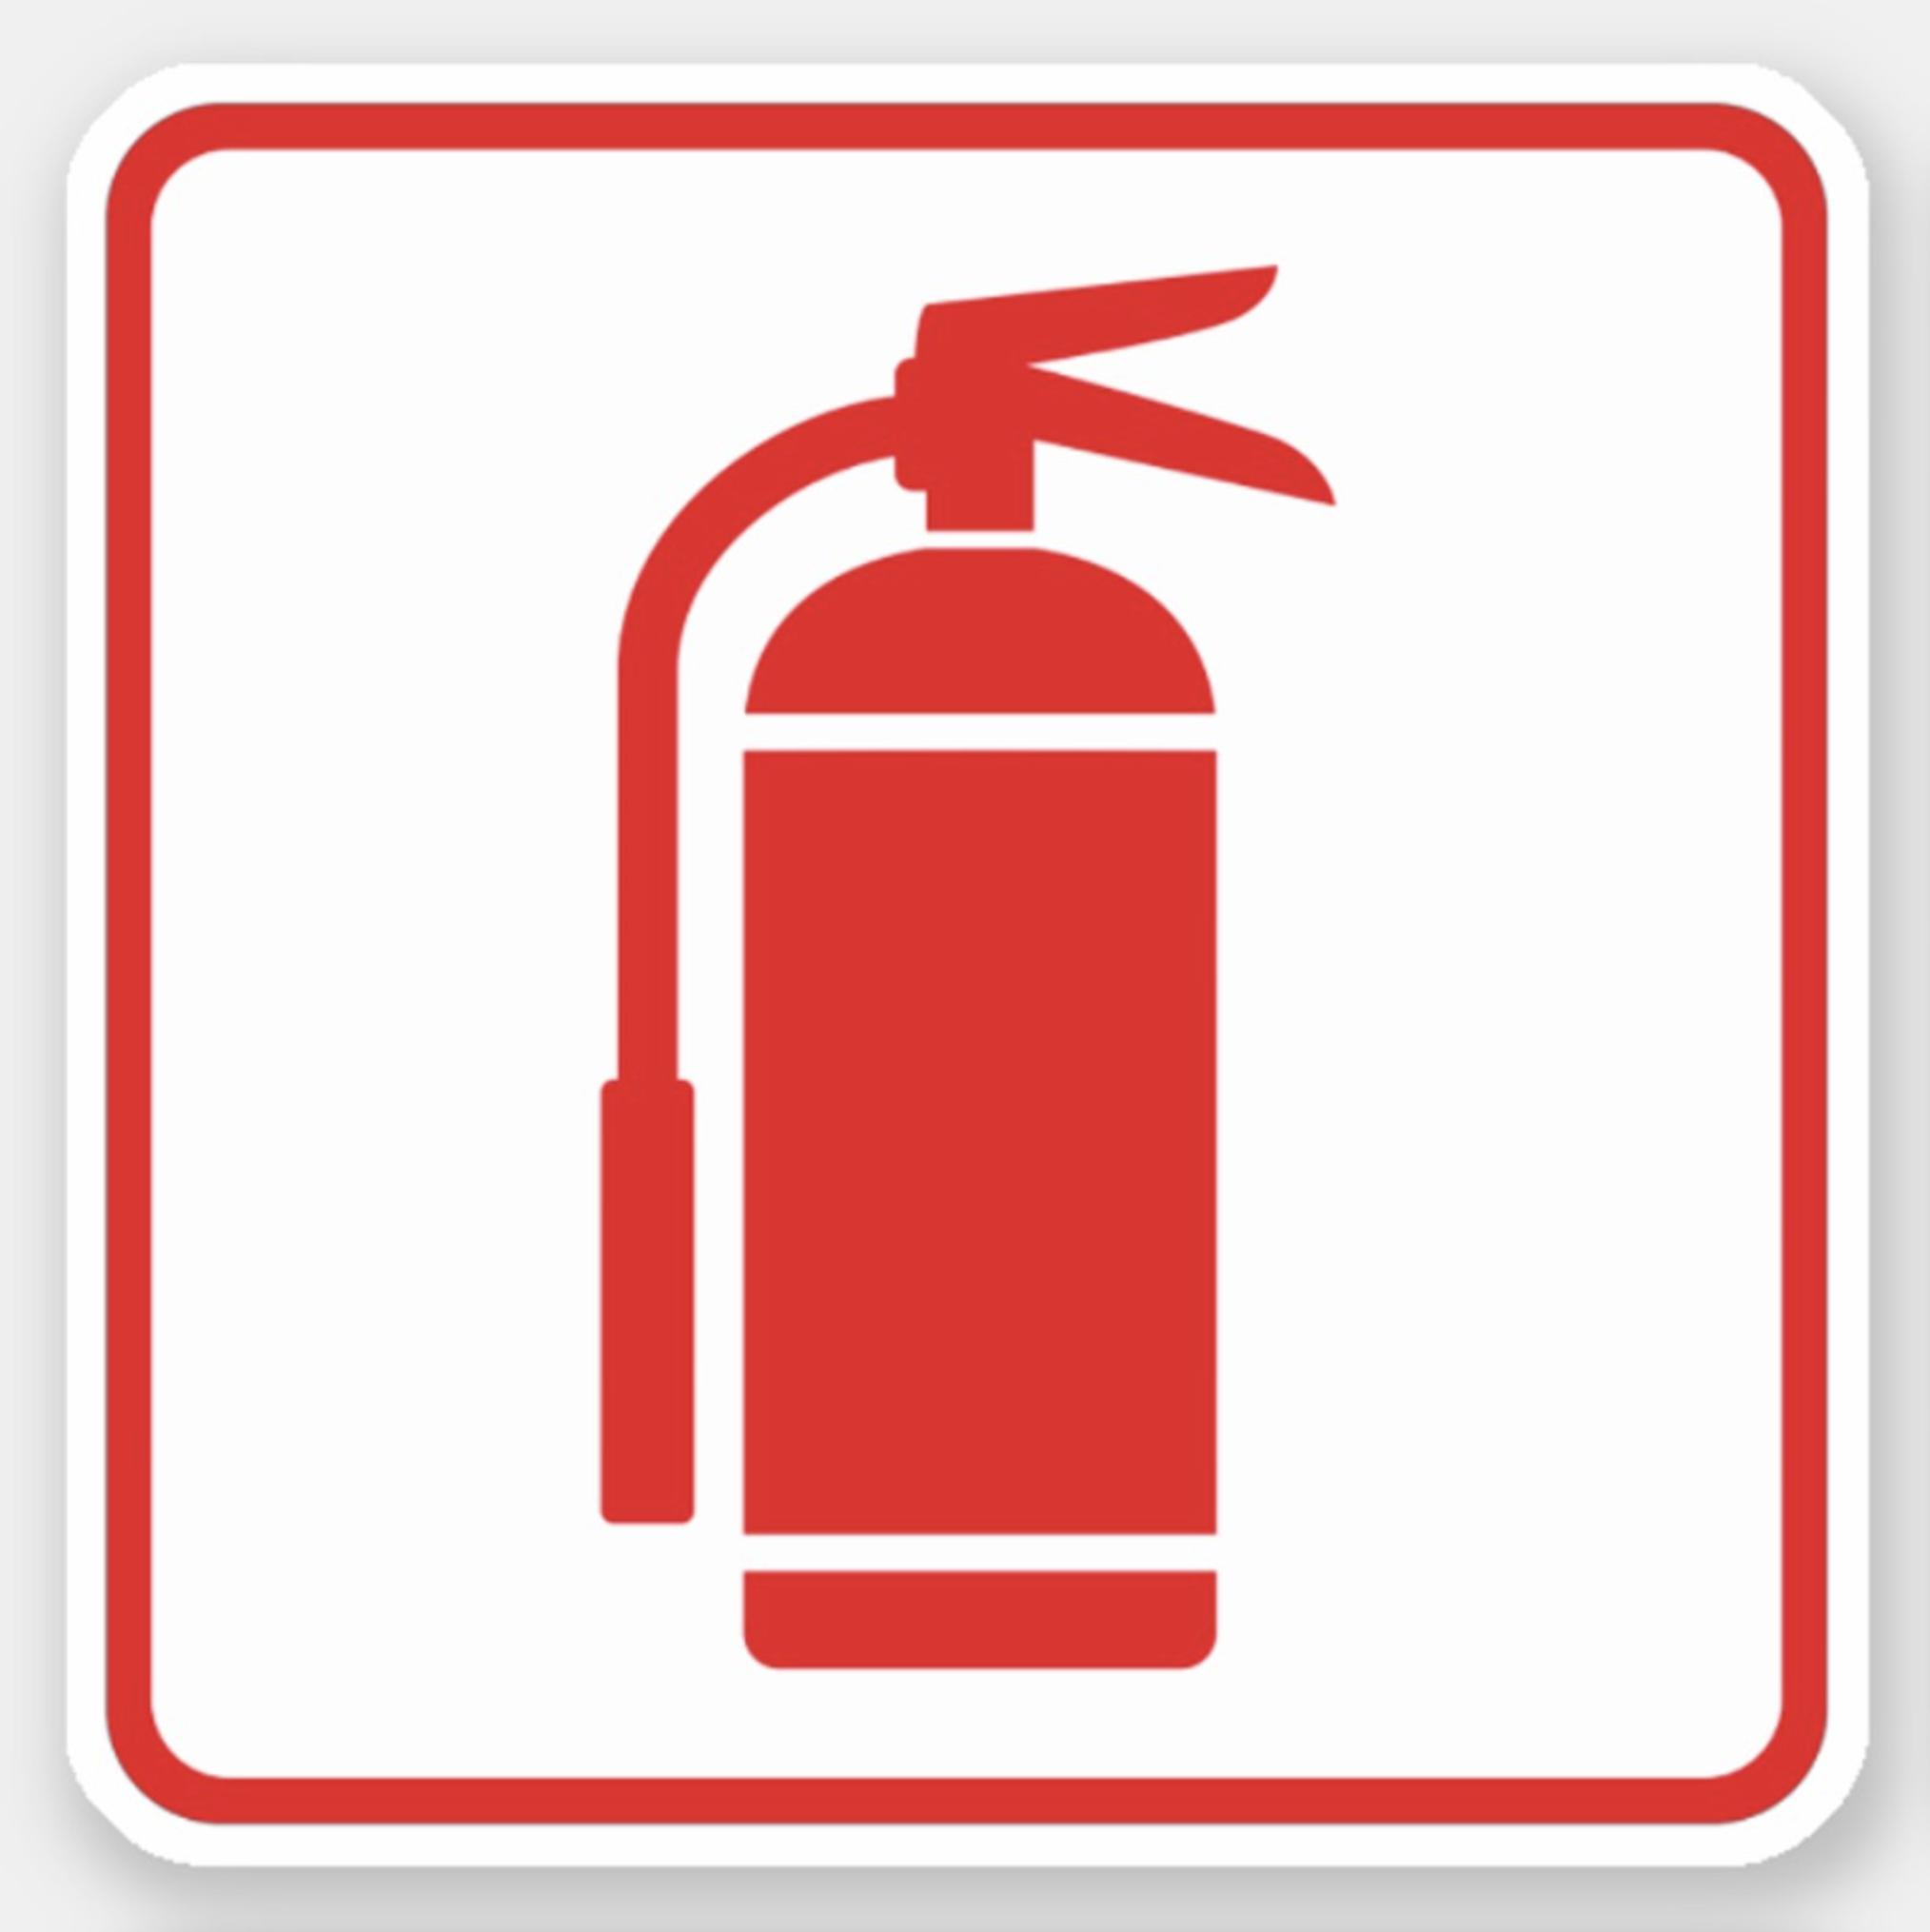 Fire extinguisher symbol, red on white, red border sticker